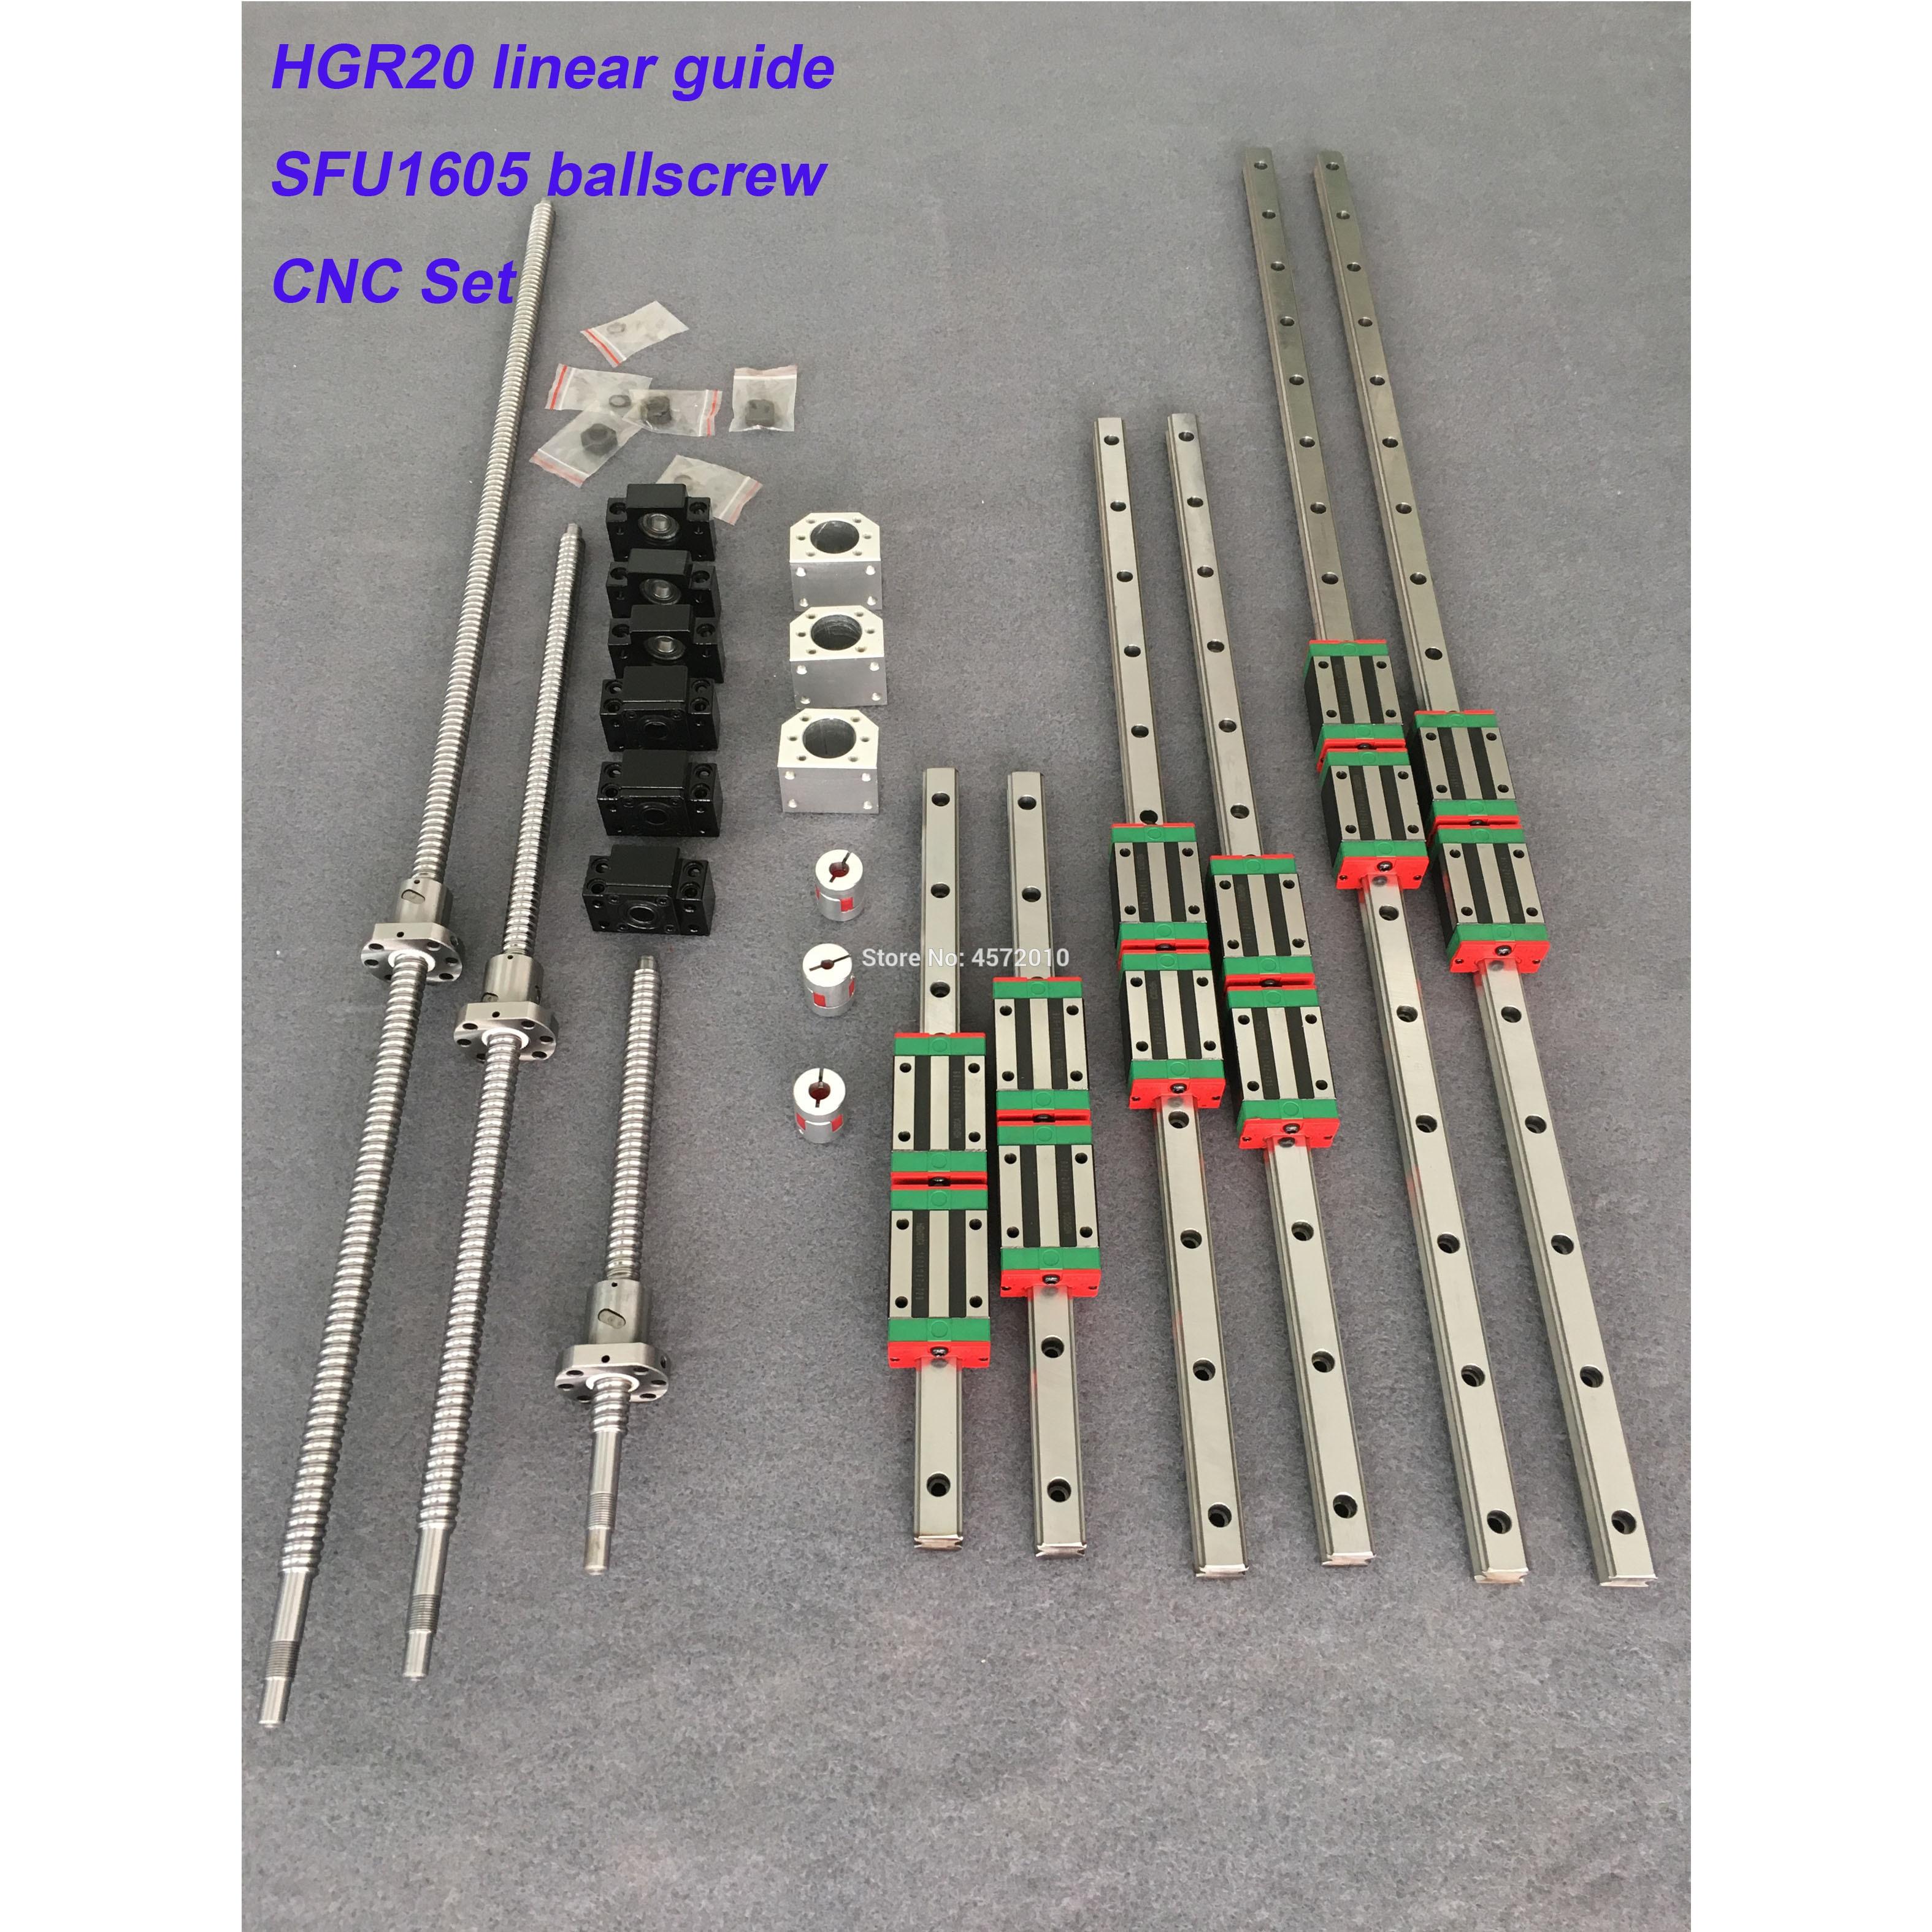 Cnc conjunto HGR20 lineal Plaza guía de 12 piezas HGH20CA + SFU605/1610/1605 bola tornillo + BK BF12 acoplamiento de carcasa para kit de motor de husillo